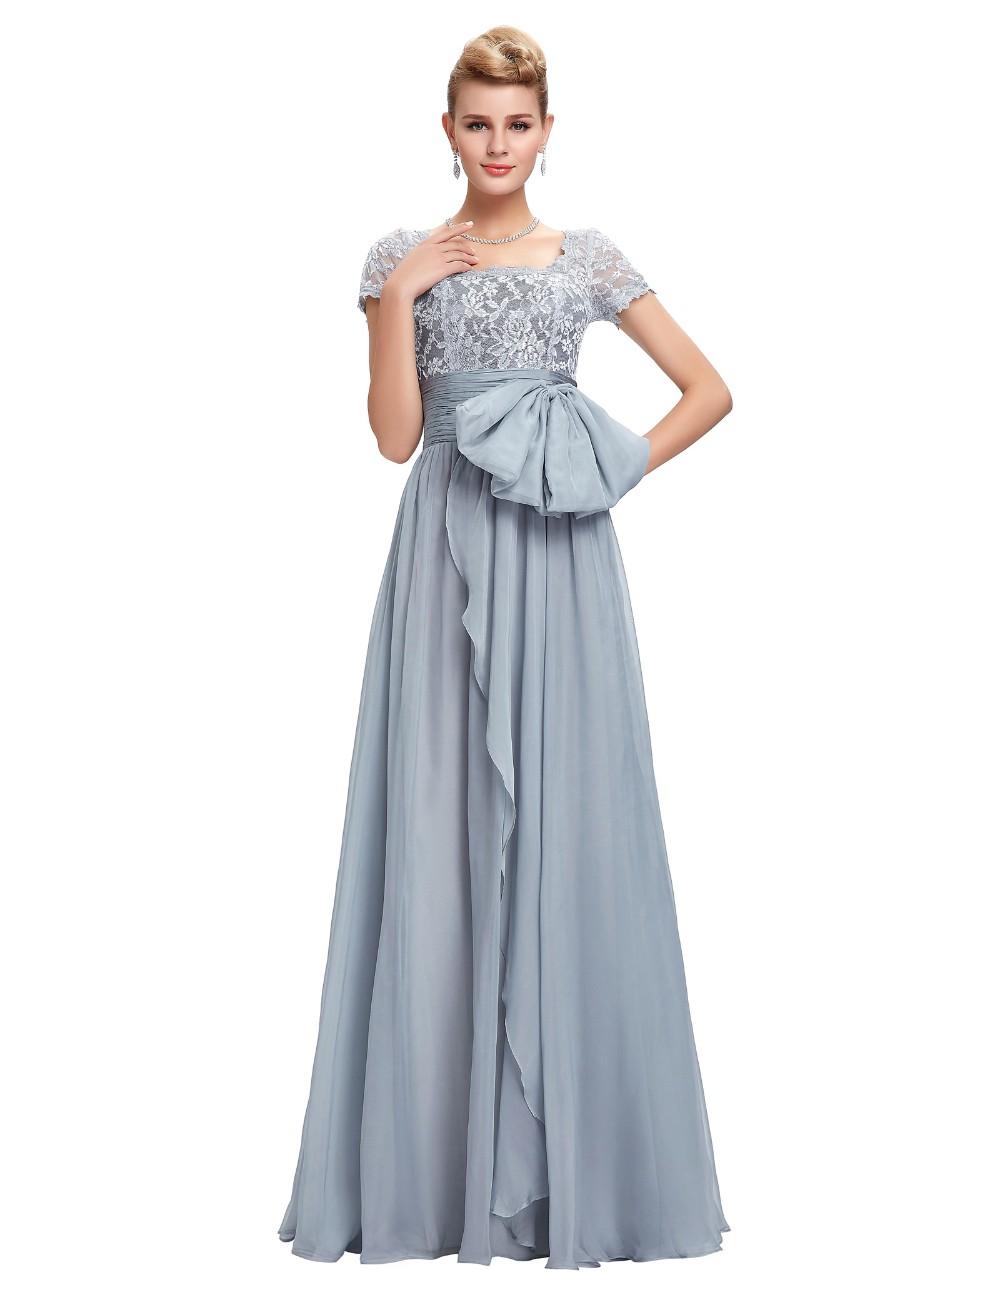 Grace Karin Chiffon Lace Elegant Long Evening Dresses Grey Formal Evening Gowns robe de soiree longue GK4445 5